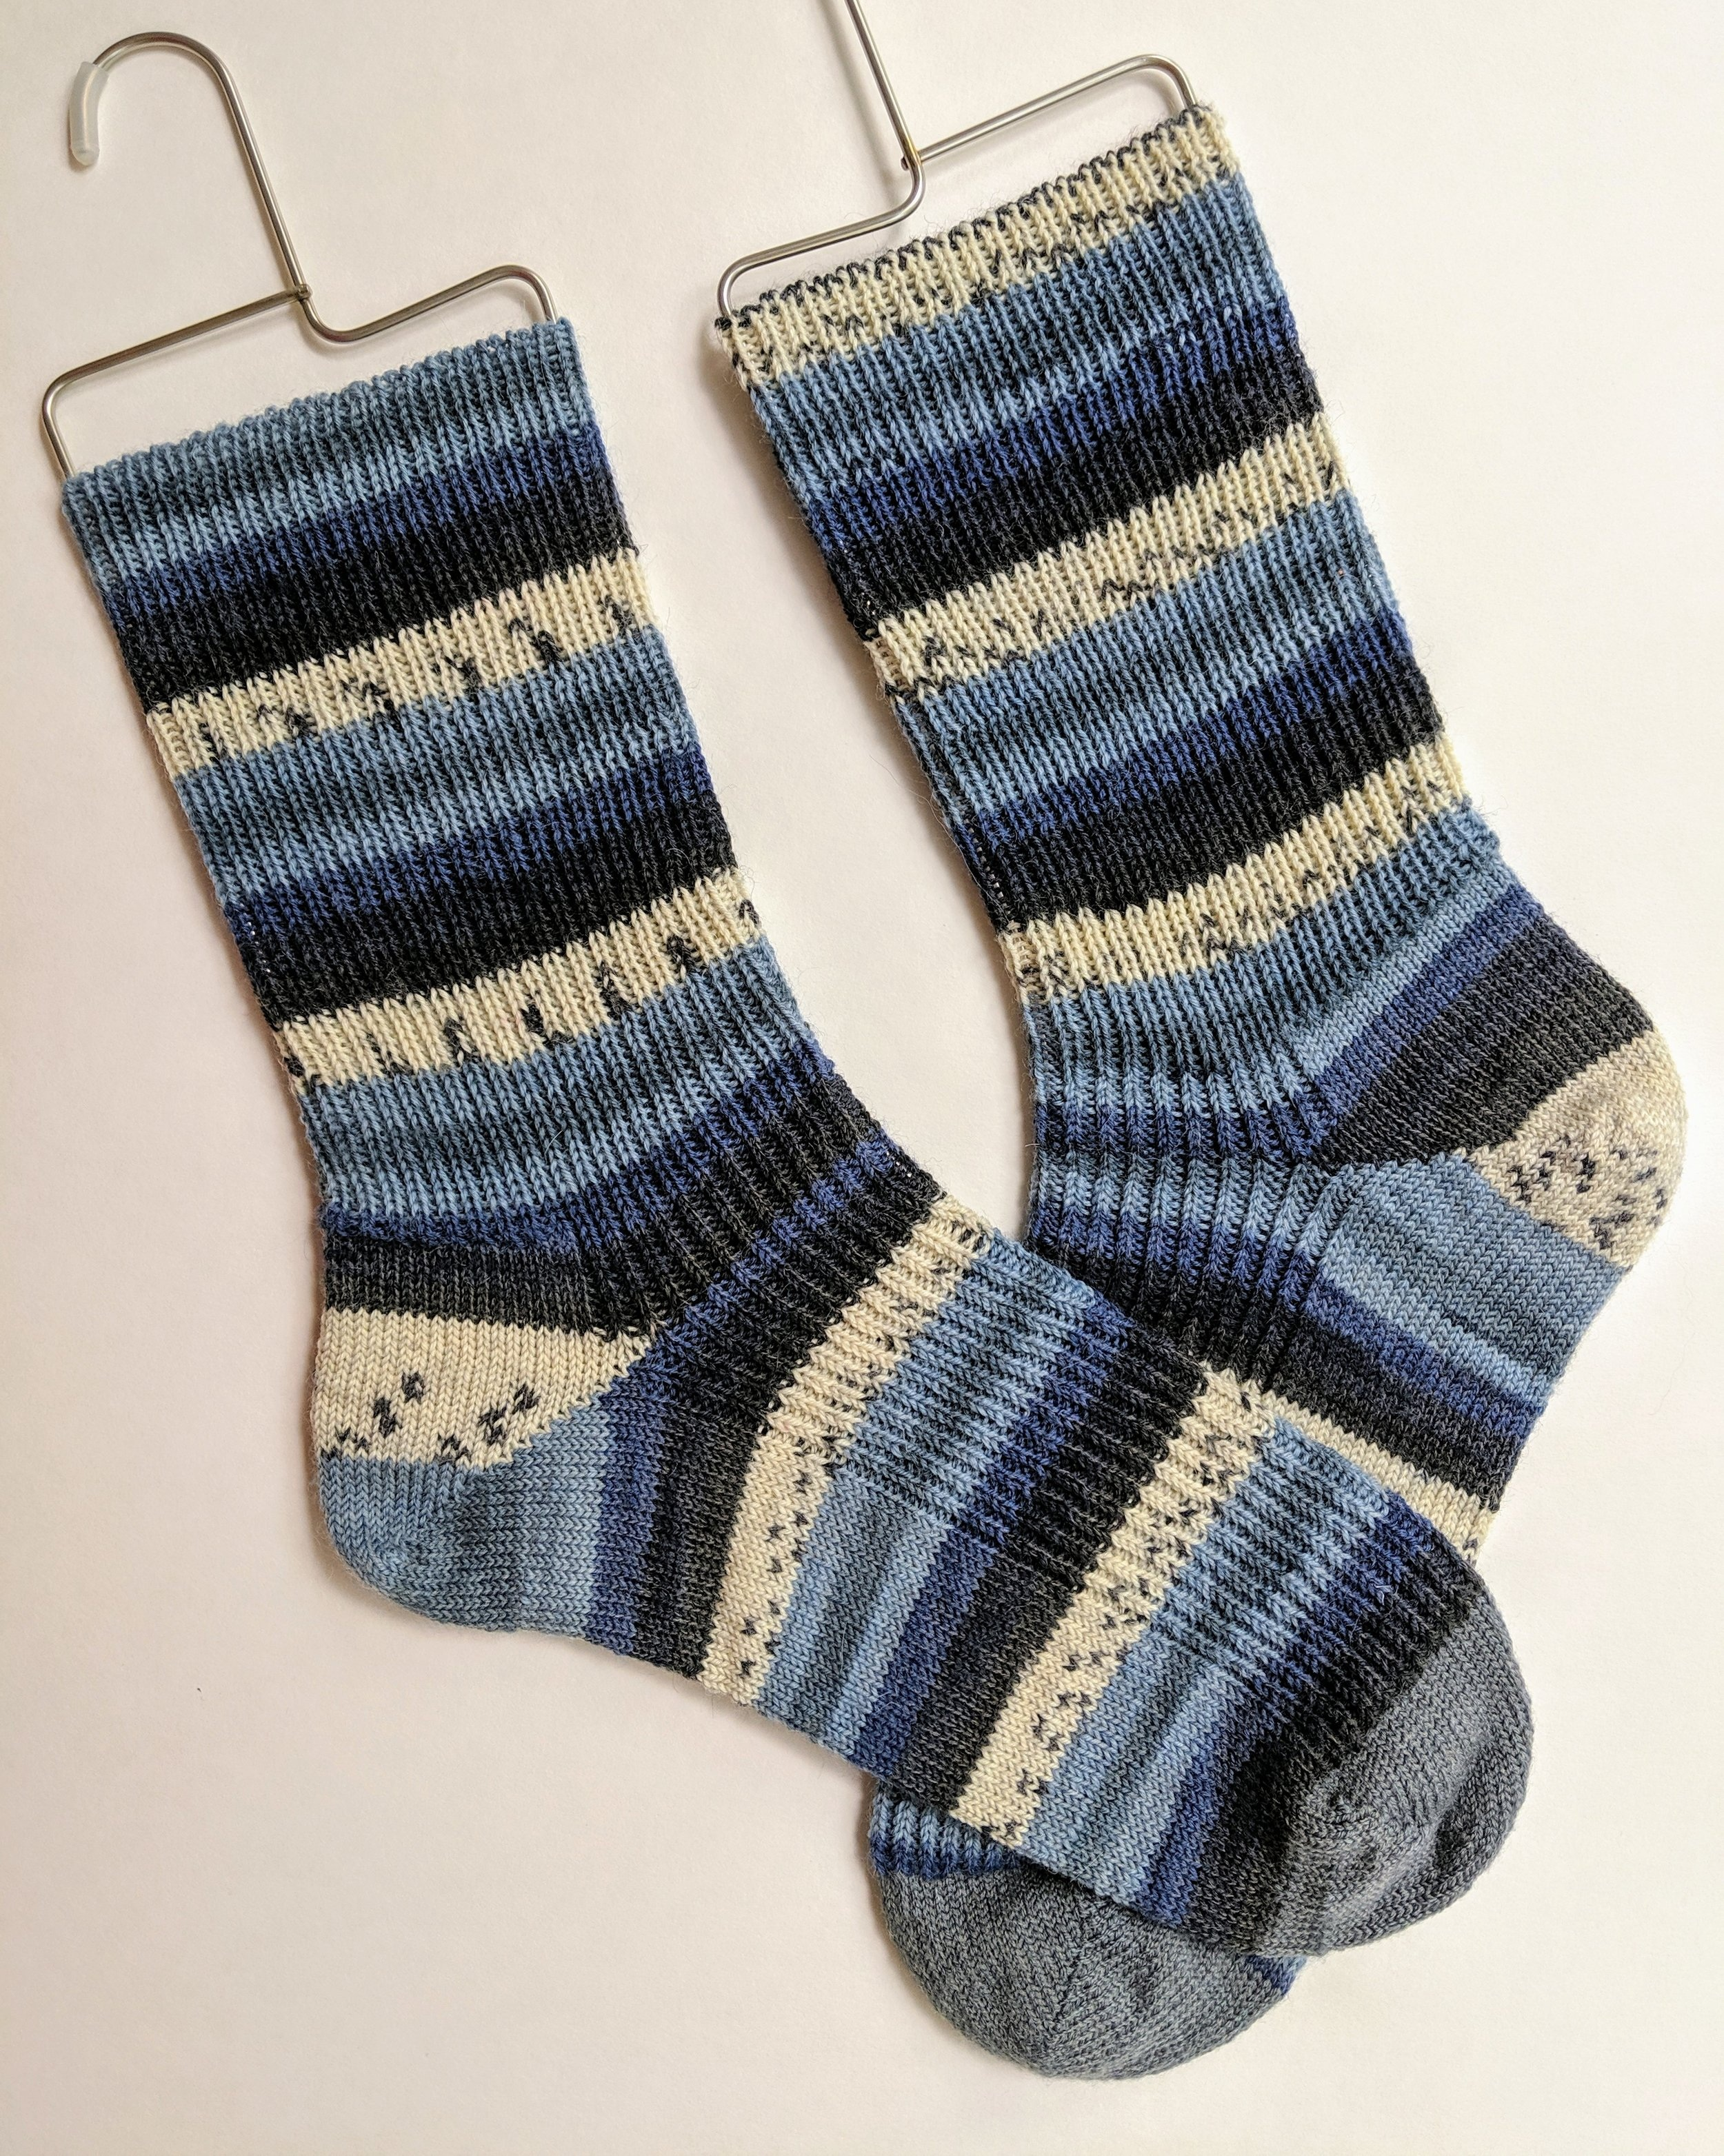 Men's ribbed socks; wool and nylon